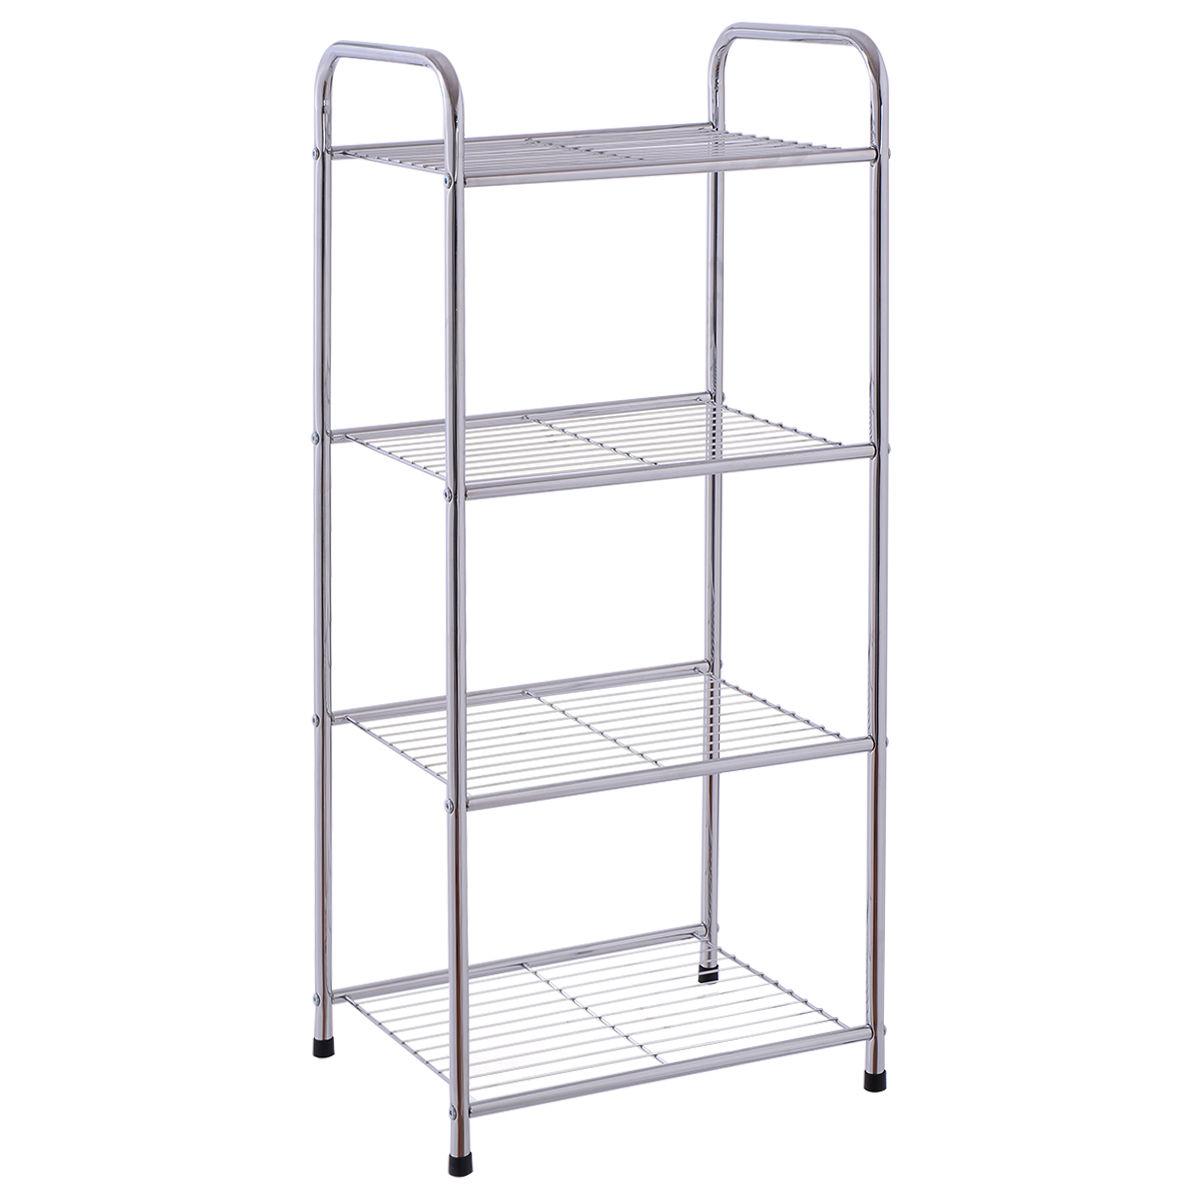 4-Tier Metal Storage Display Shelf